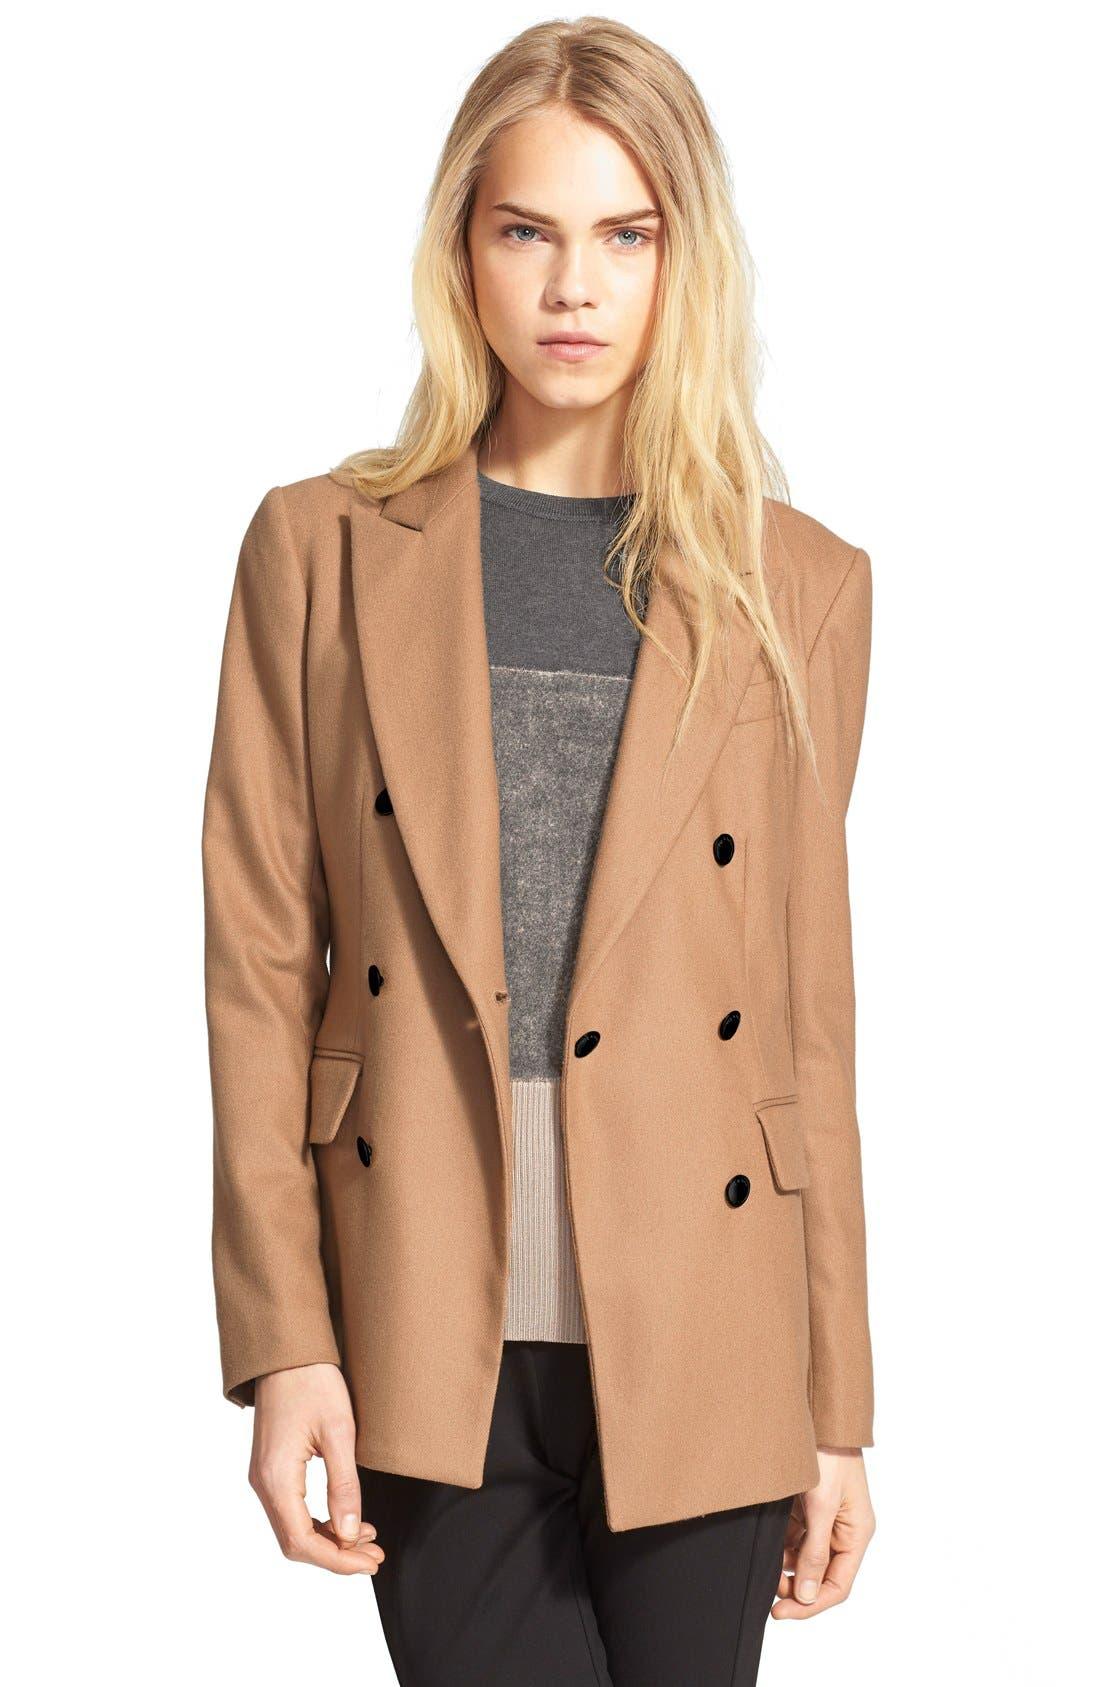 Alternate Image 1 Selected - rag & bone 'Corin' Wool Blend Blazer